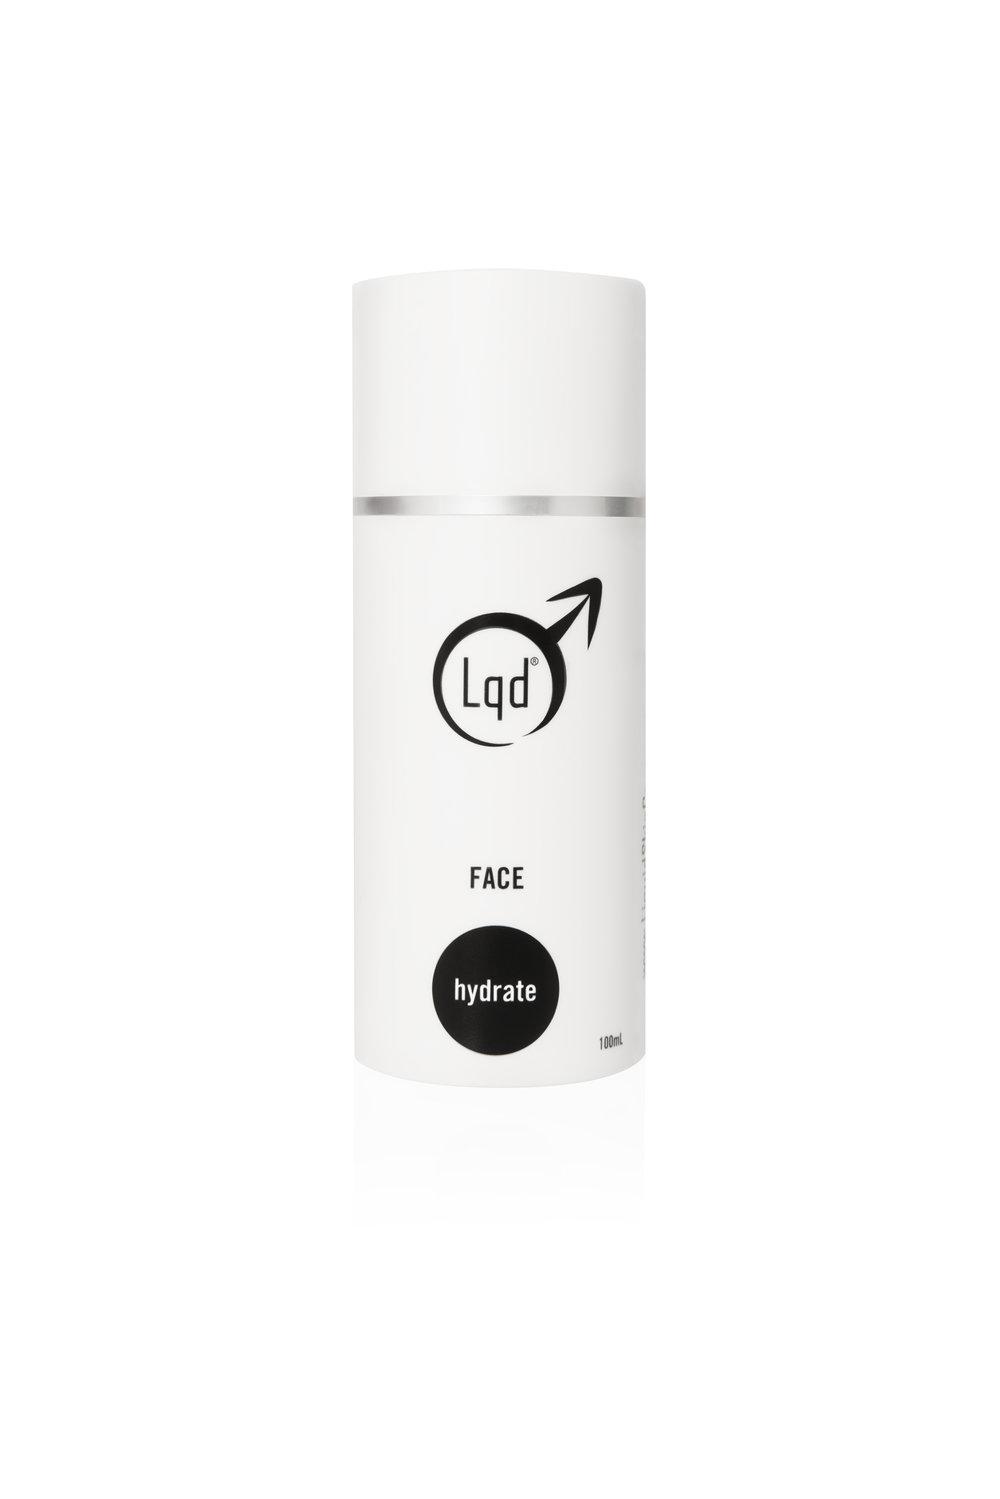 white-LQD-Face-hydrate.jpg